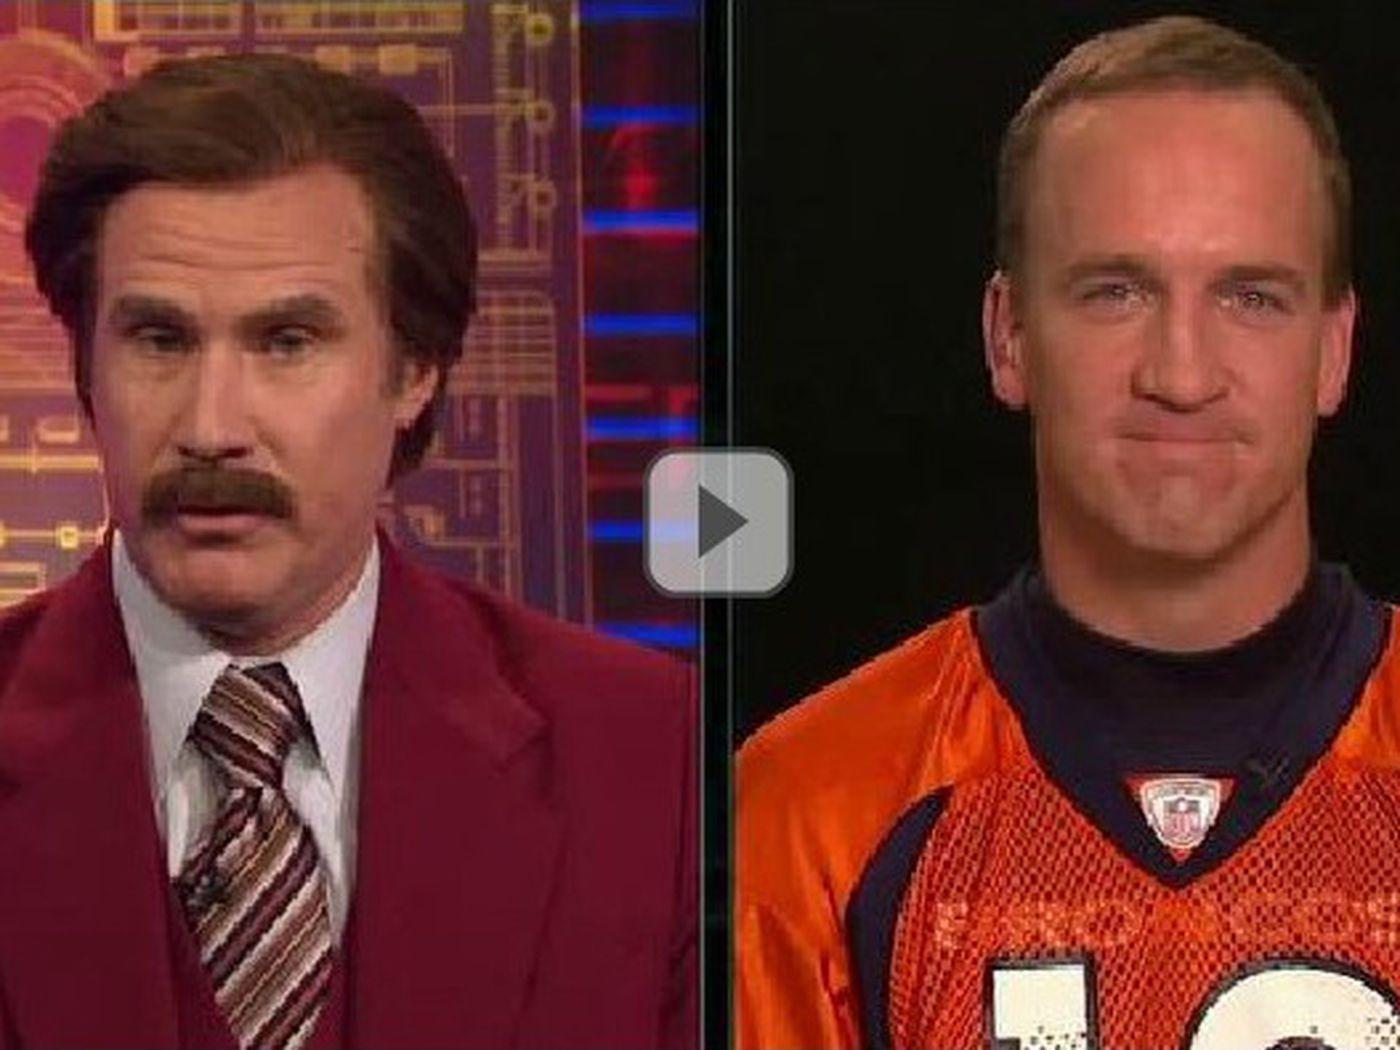 669553f5f Anchorman Ron Burgundy Interviews Peyton Manning - Mile High Report